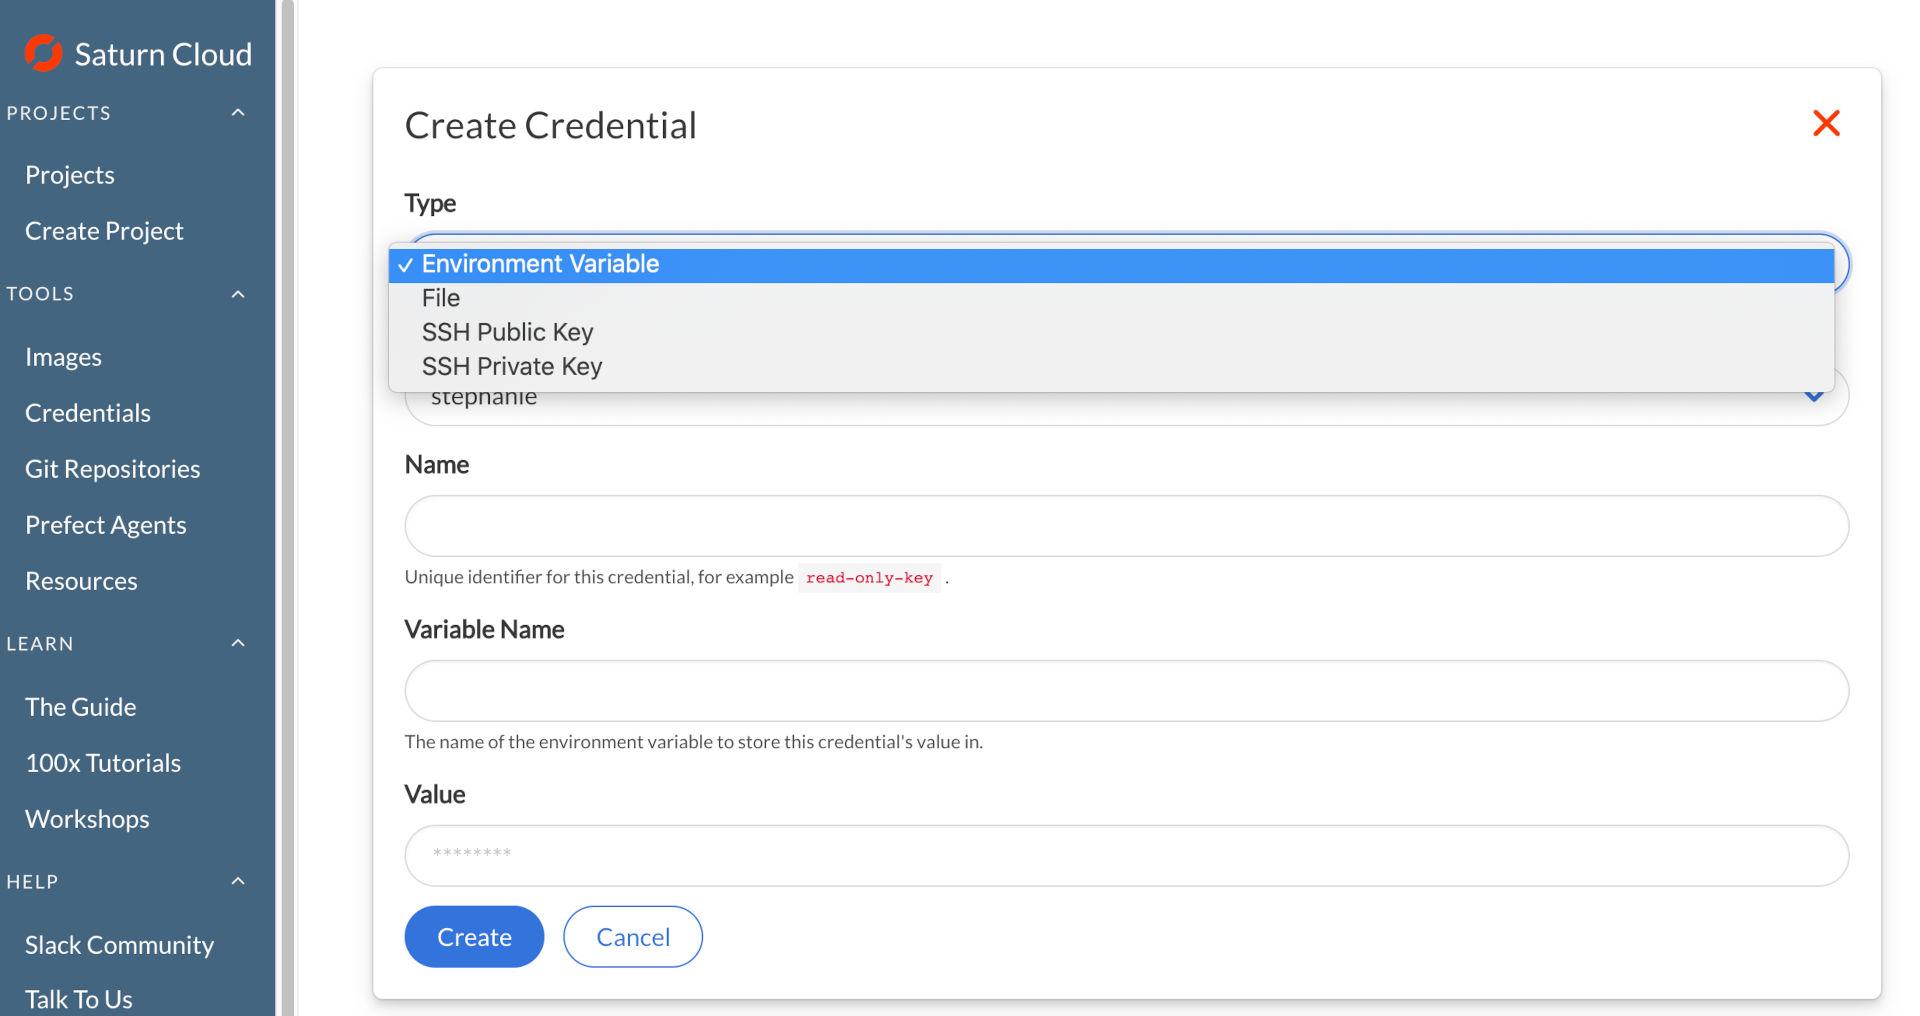 Screenshot of Saturn Cloud Create Credentials form